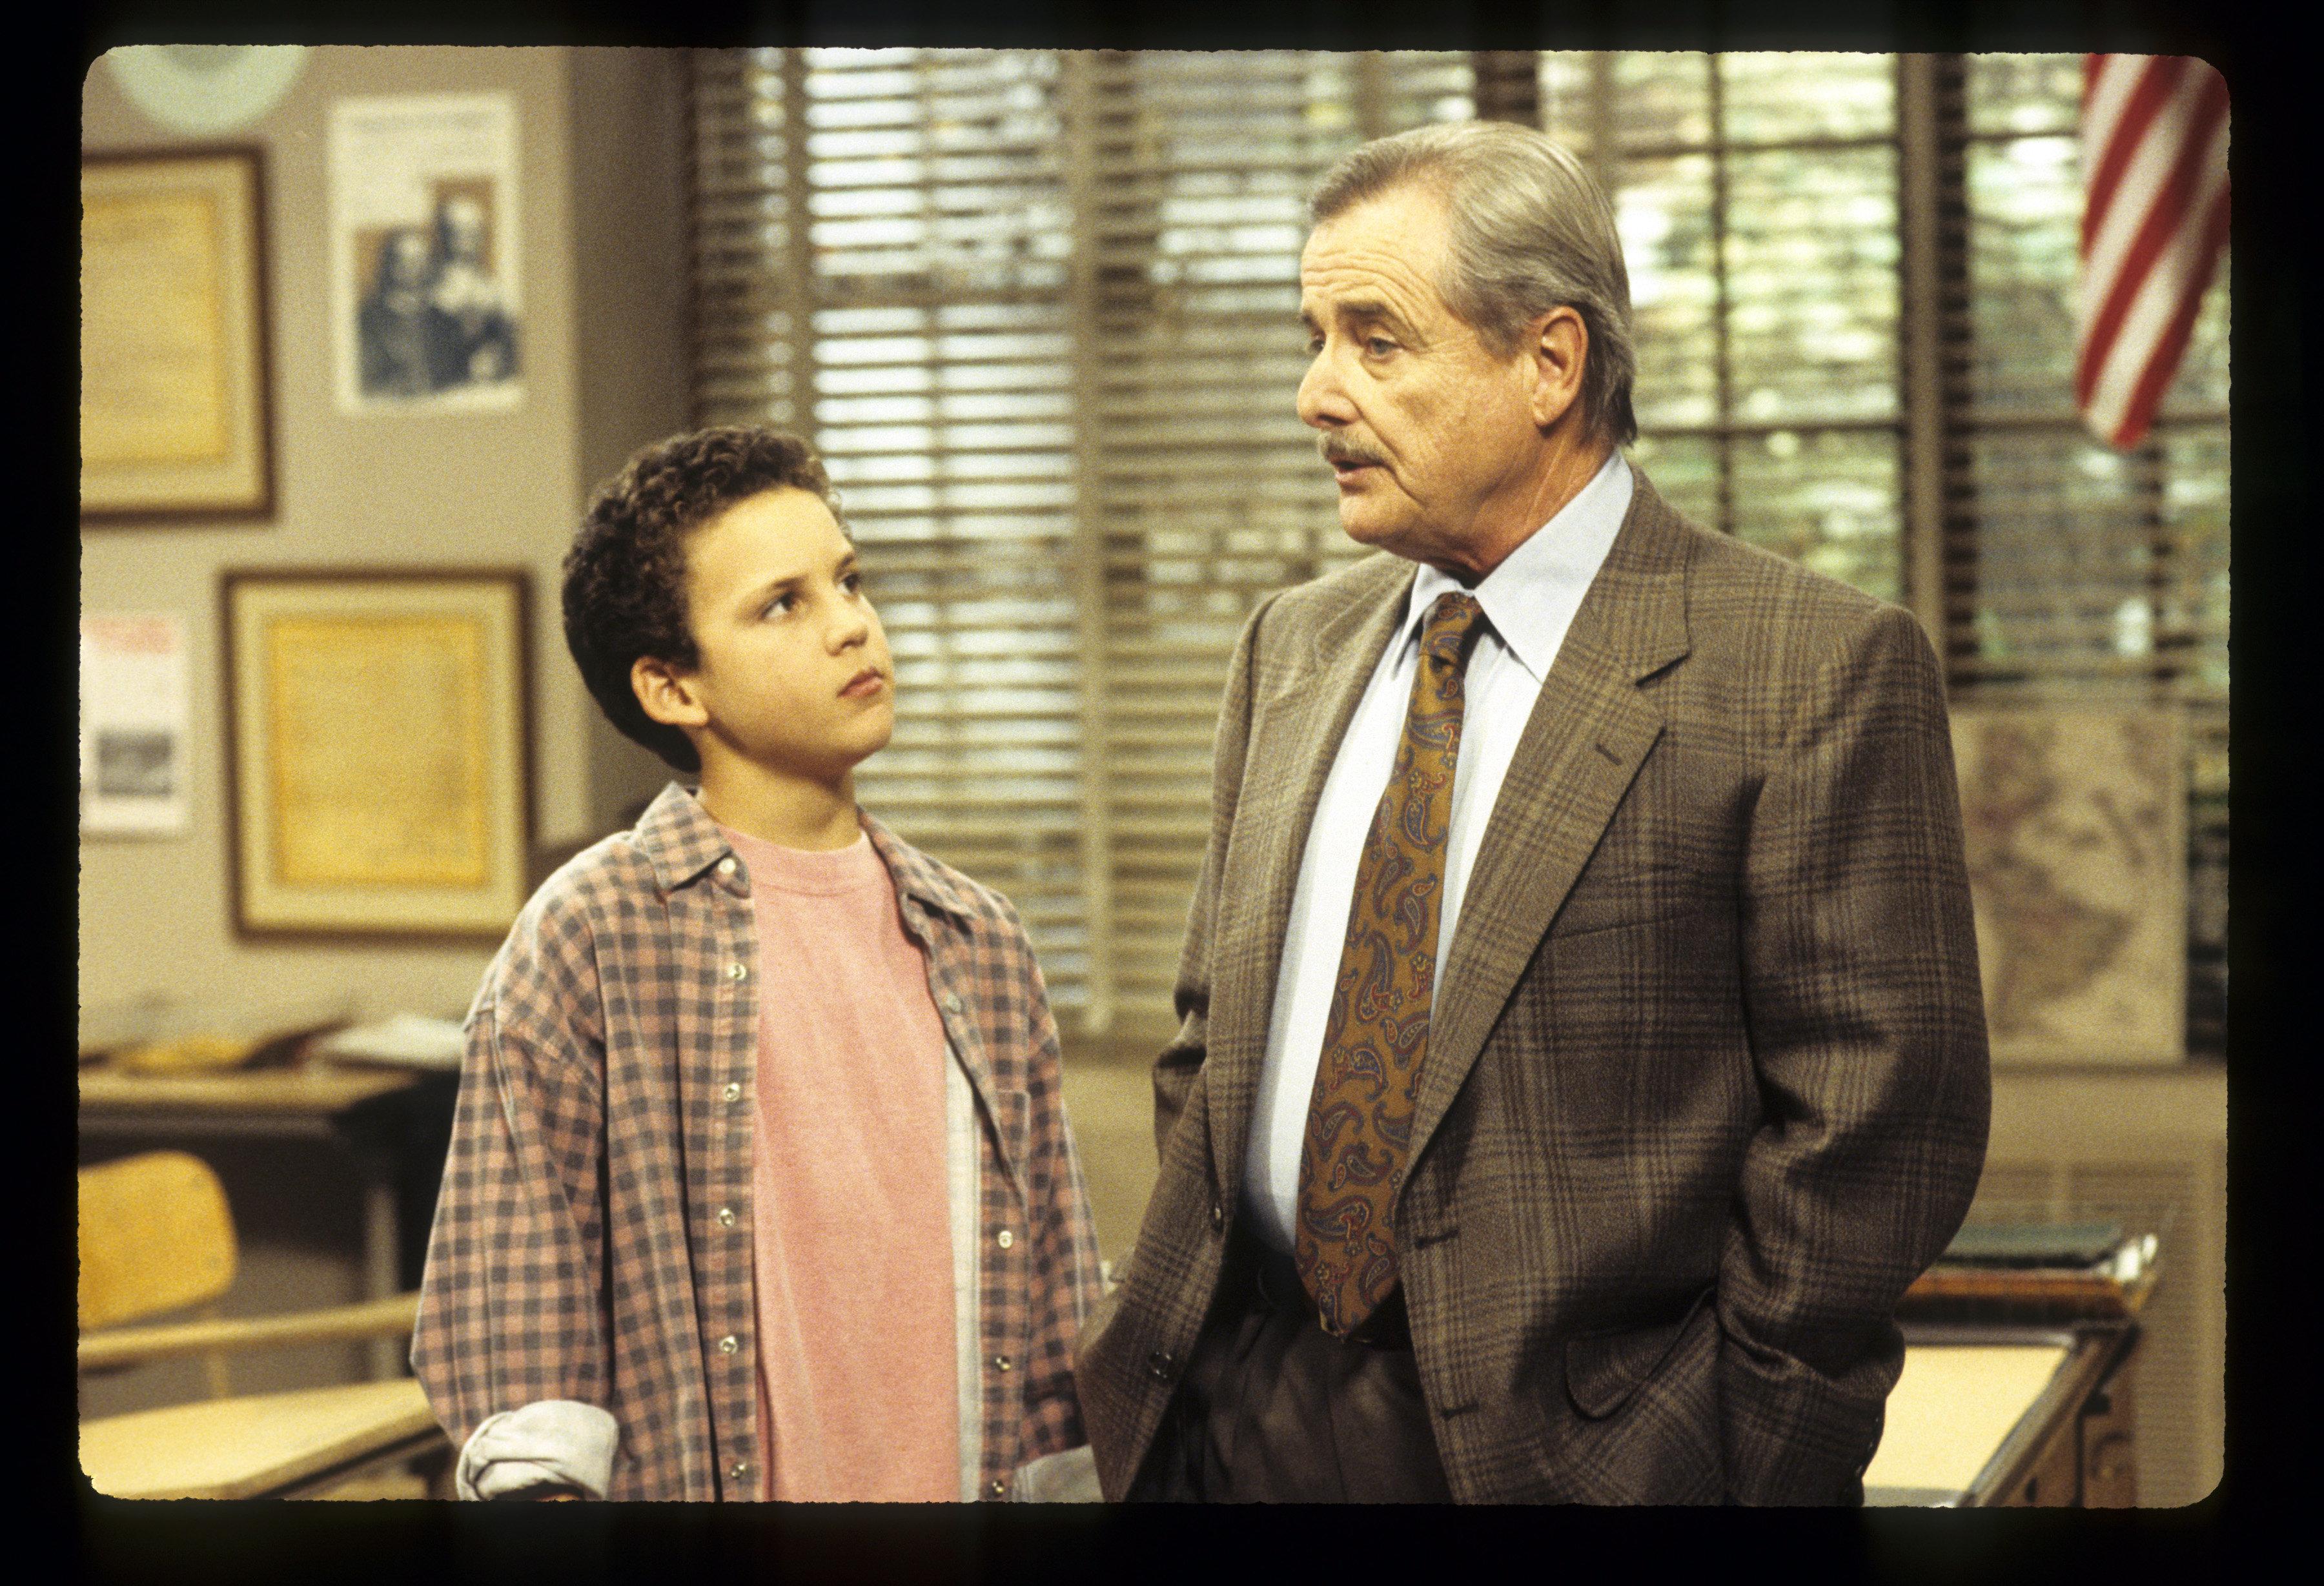 BOY MEETS WORLD - 'Teacher's Bet' - Airdate: November 19, 1993. (Photo by ABC Photo Archives/ABC via Getty Images) L-R: BEN SAVAGE;WILLIAM DANIELS